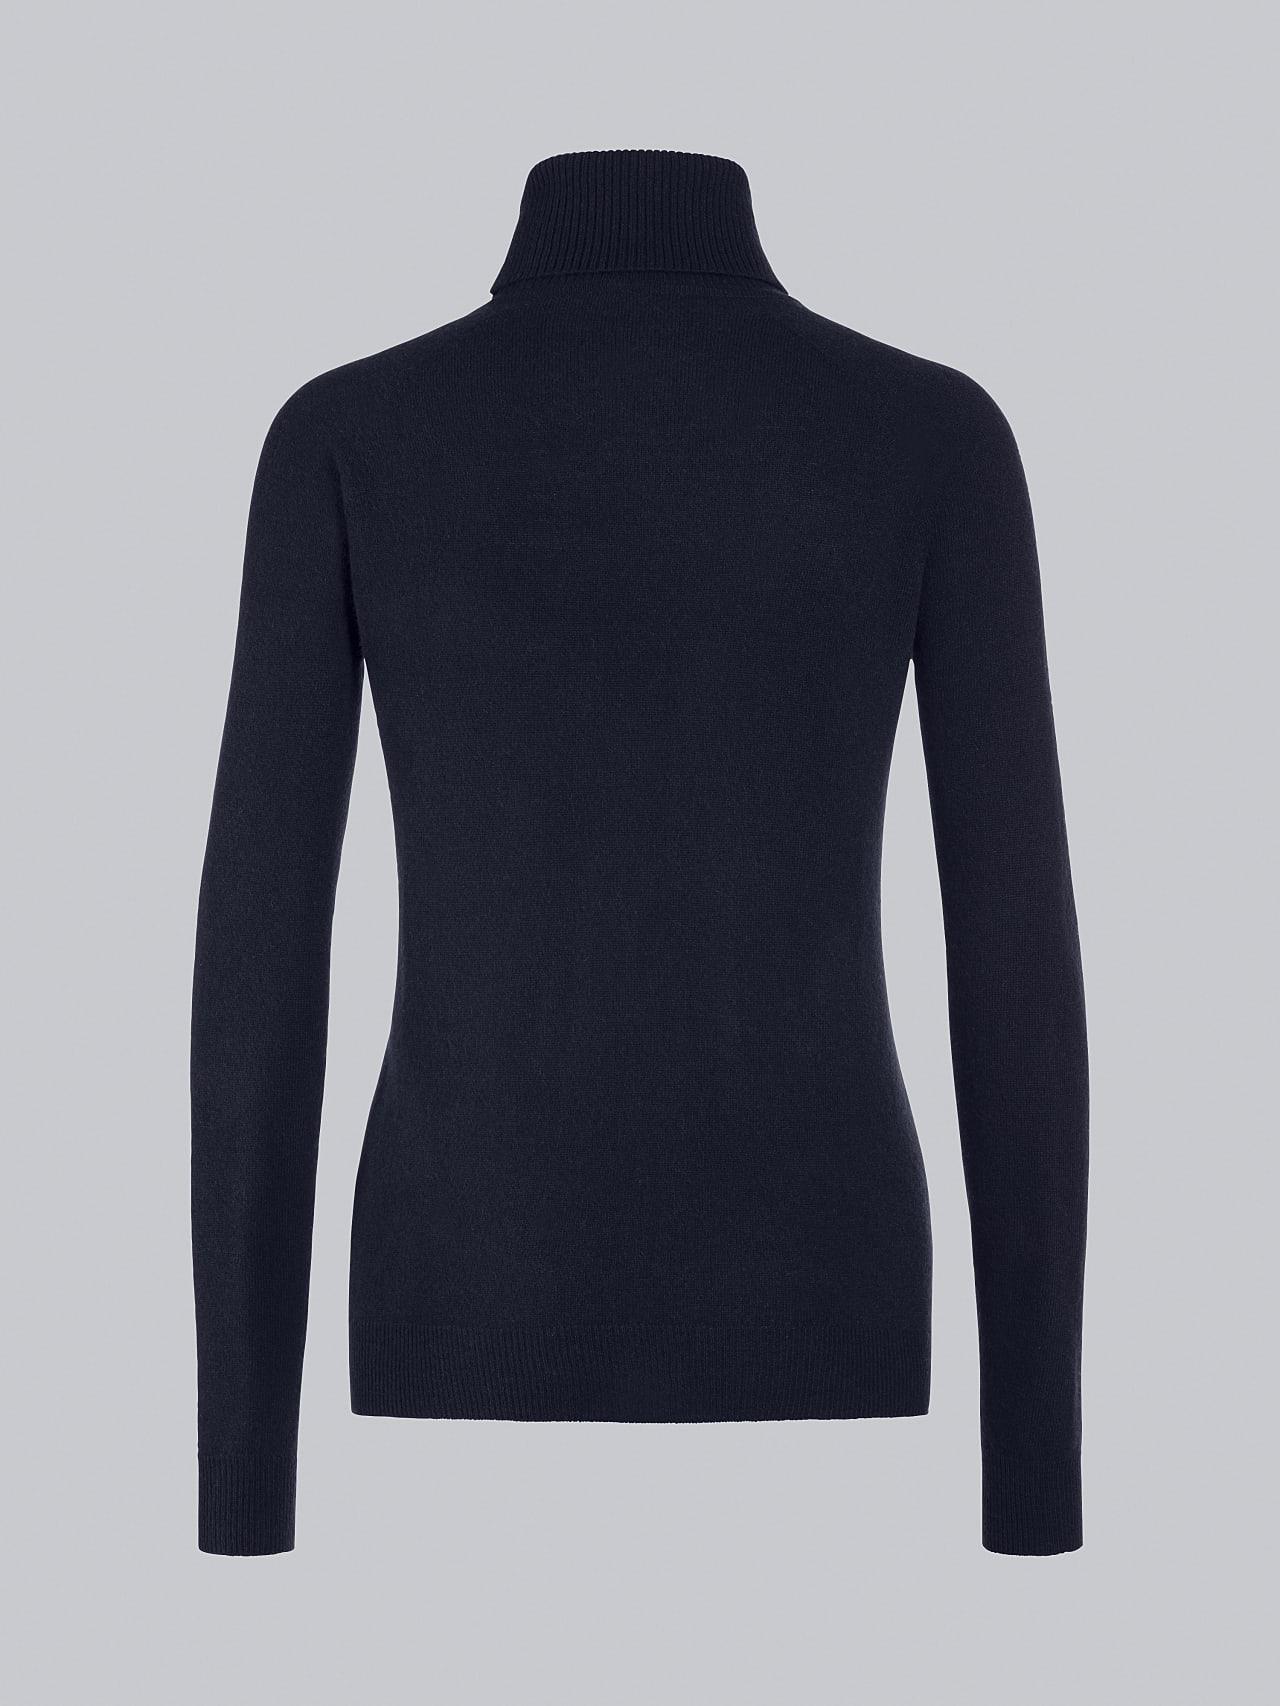 FLAMY V1.Y5.02 Seamless 3D Knit Merino-Cashmere Turtle Neck navy Left Alpha Tauri